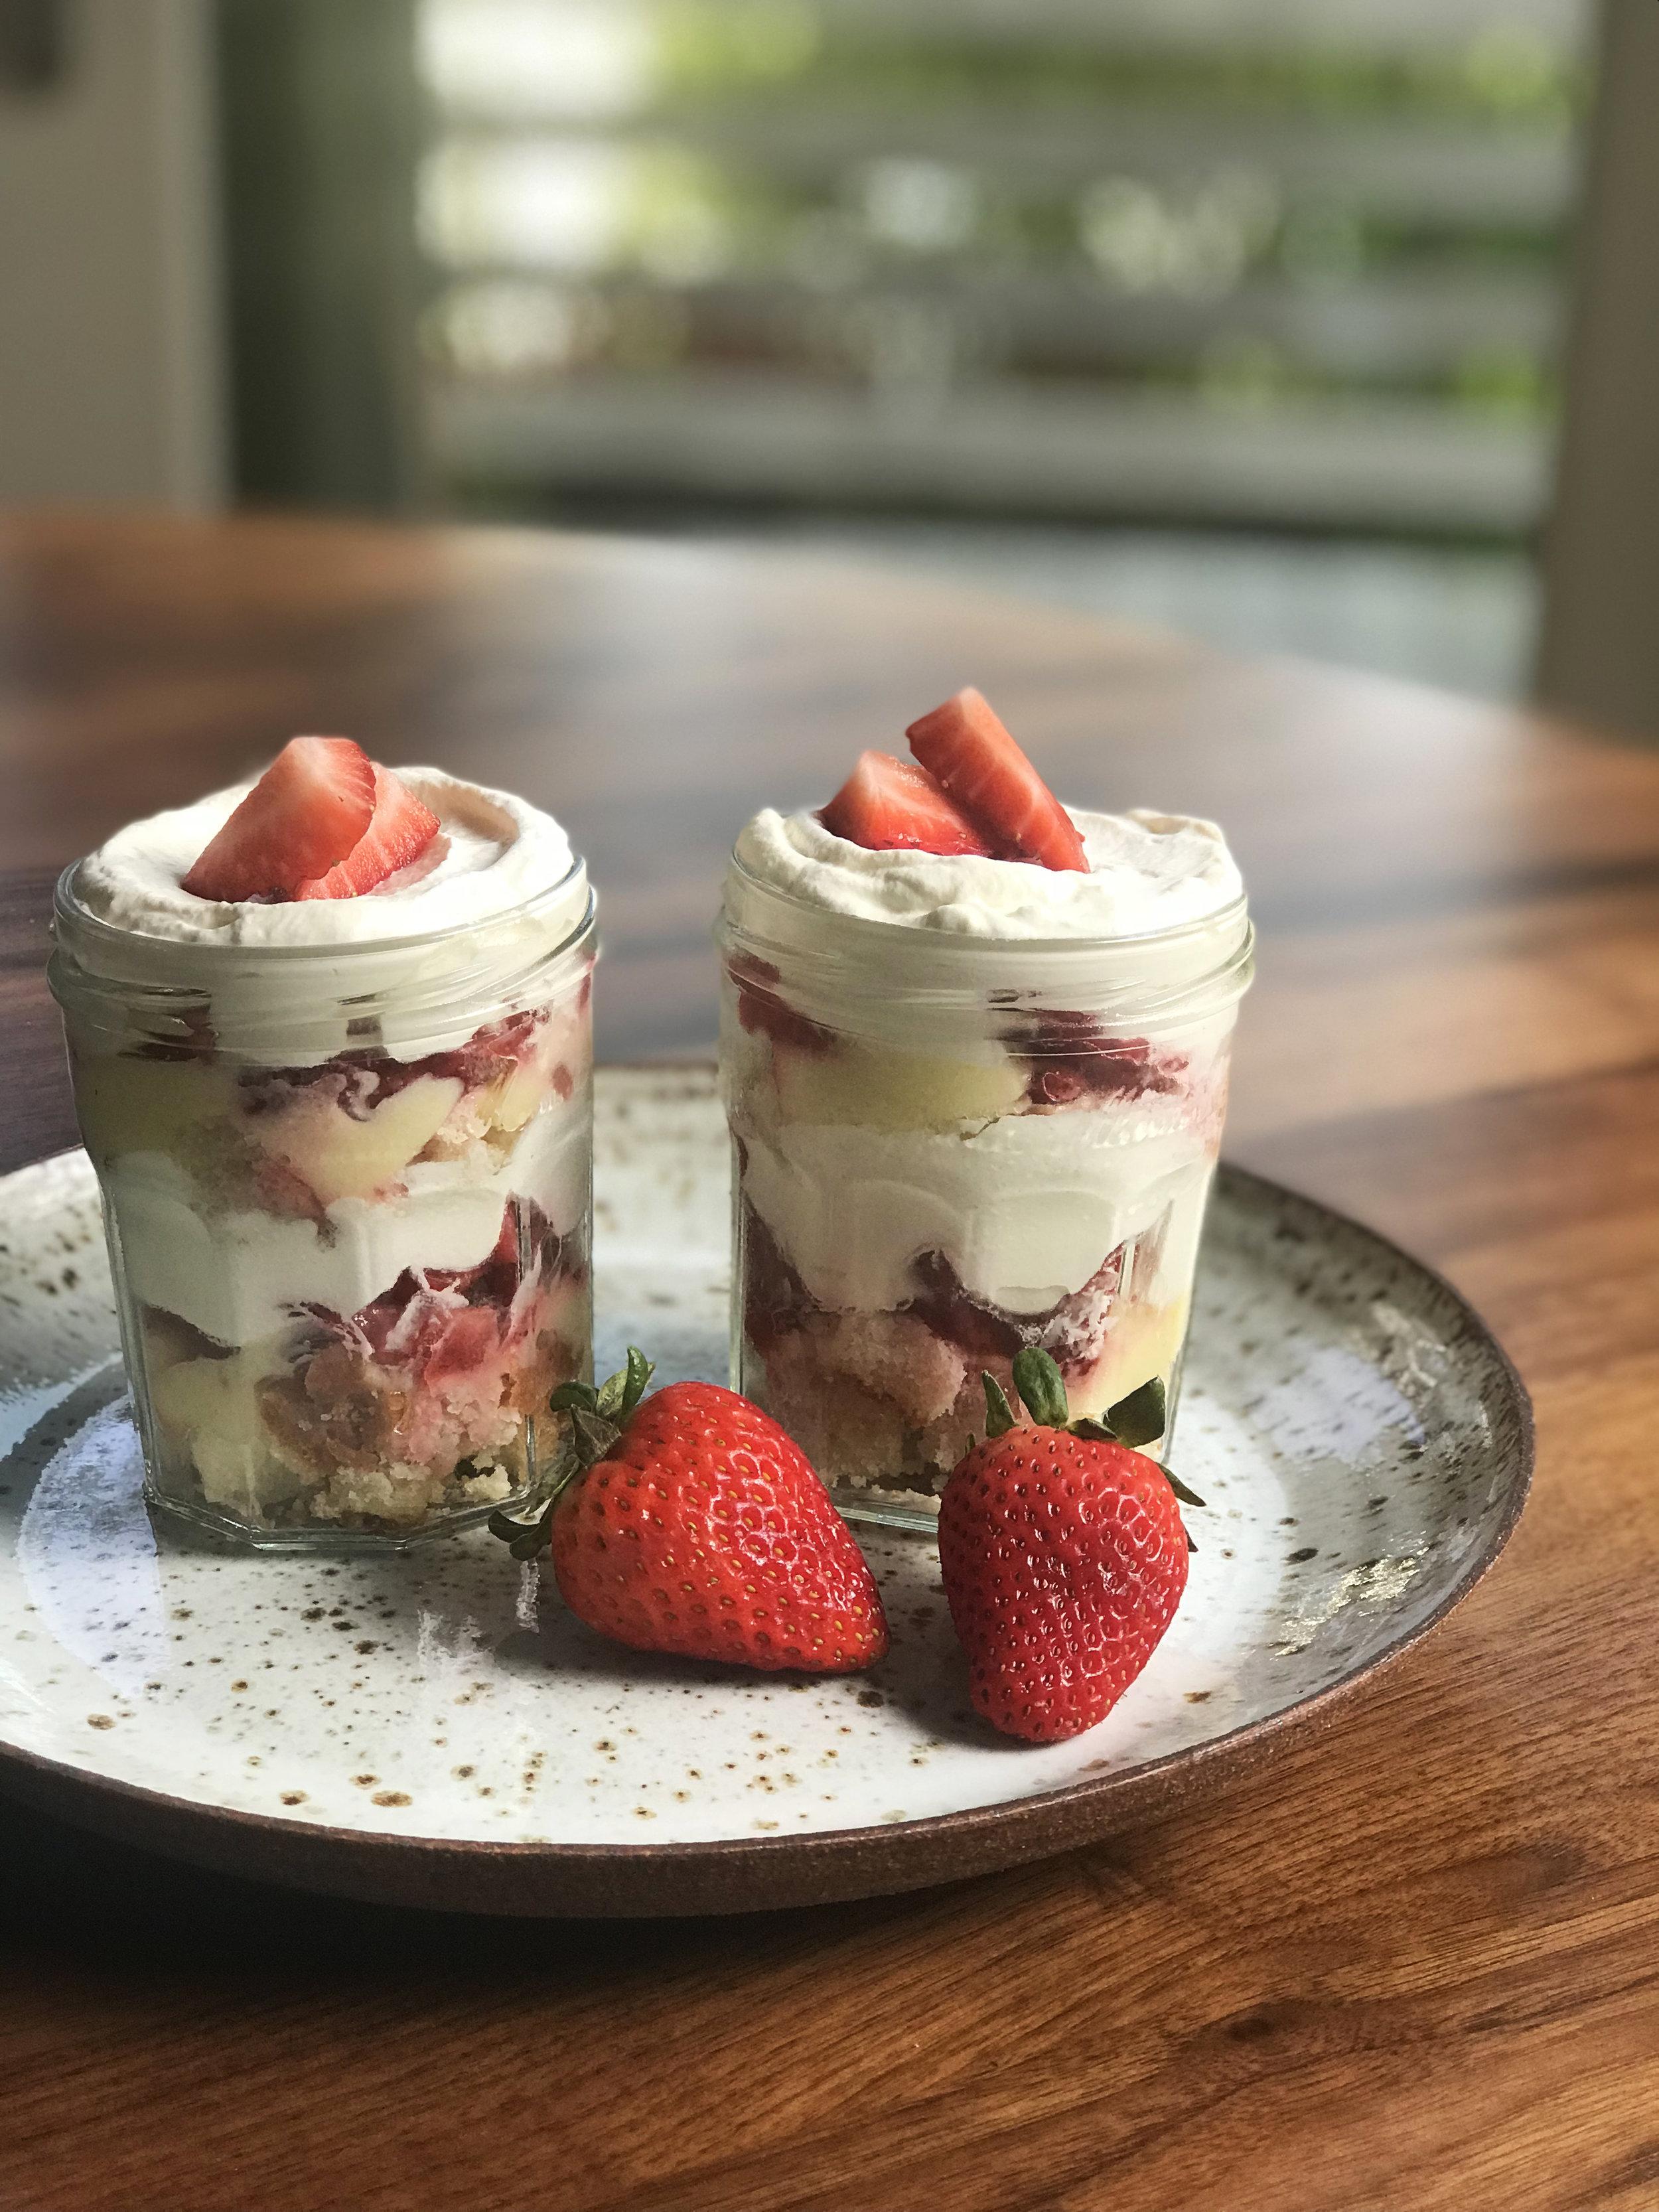 Strawberry_Lemon_Parfeit_Recipe_Summer_Parfeits_Best_Strawberry_Dessert_Easy_Strawberry_Lemon_Dessert_Layered_Dessert_Dessert_Fiend.JPG